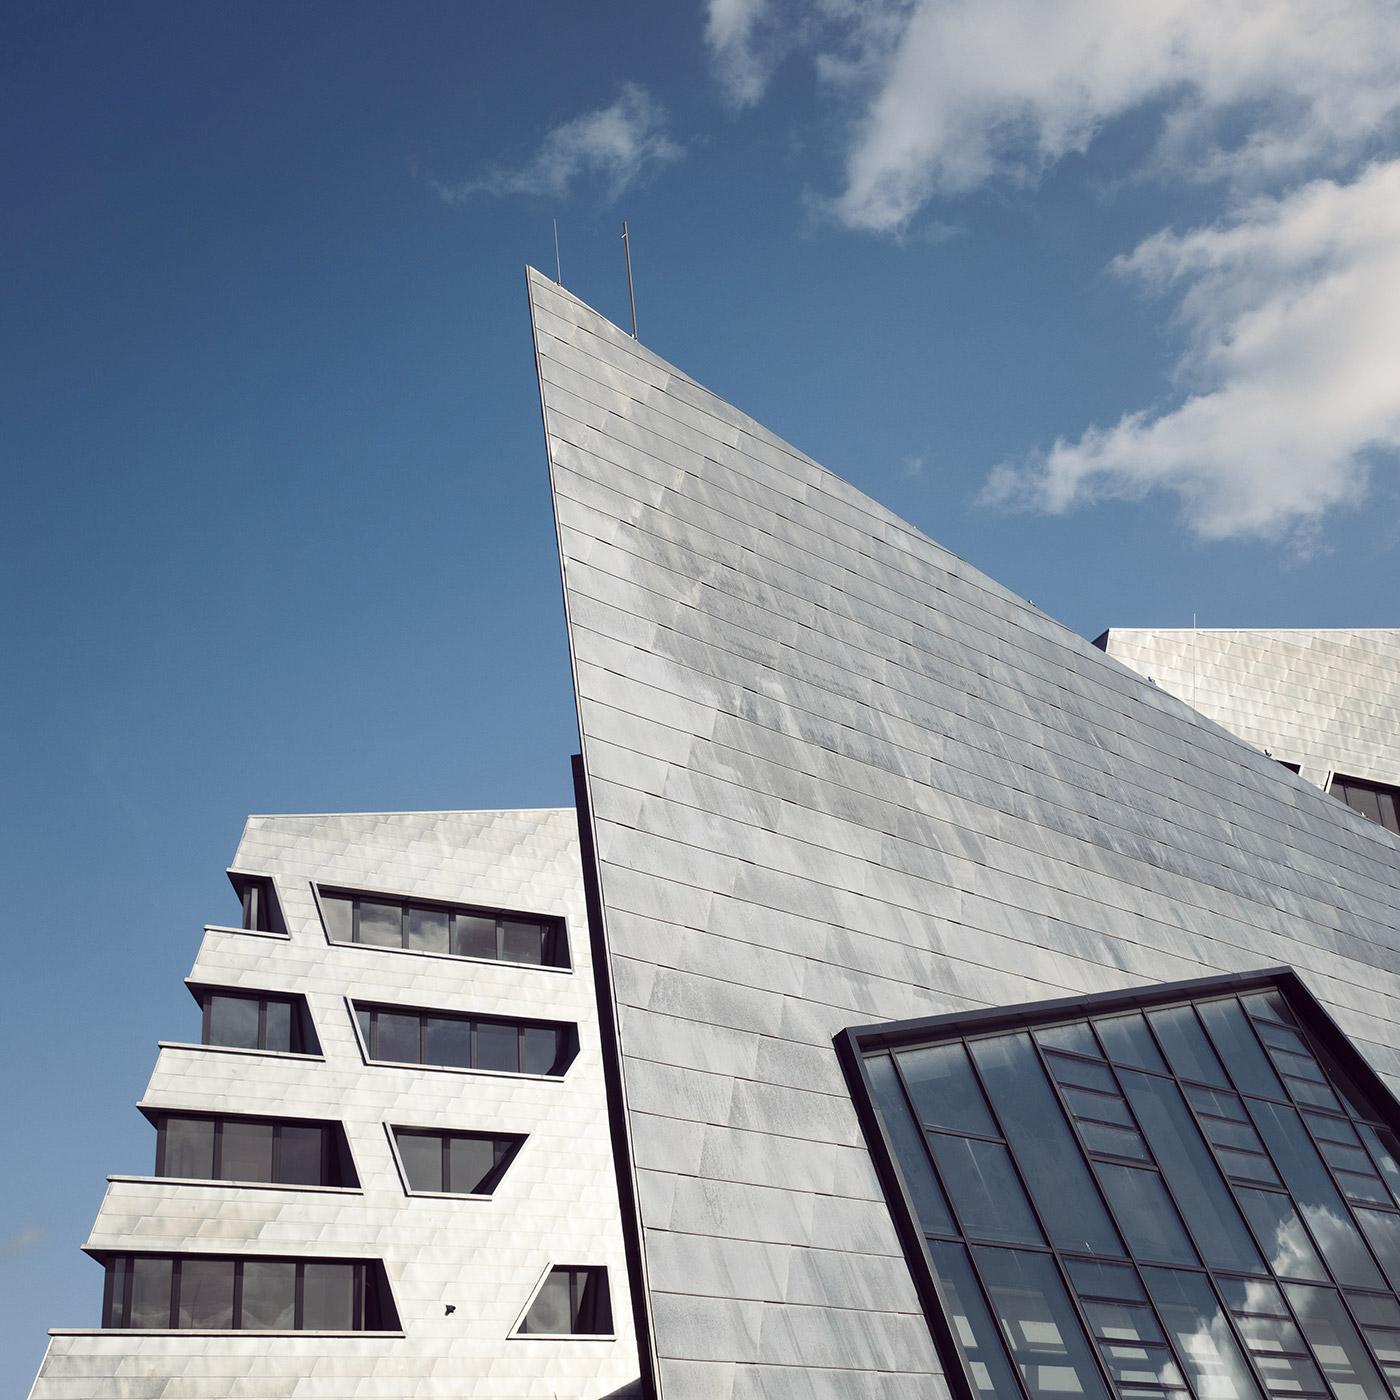 Leuphana University of Lüneburg <br />Location: Lüneburg, Germany <br />Architects: Daniel Libeskind